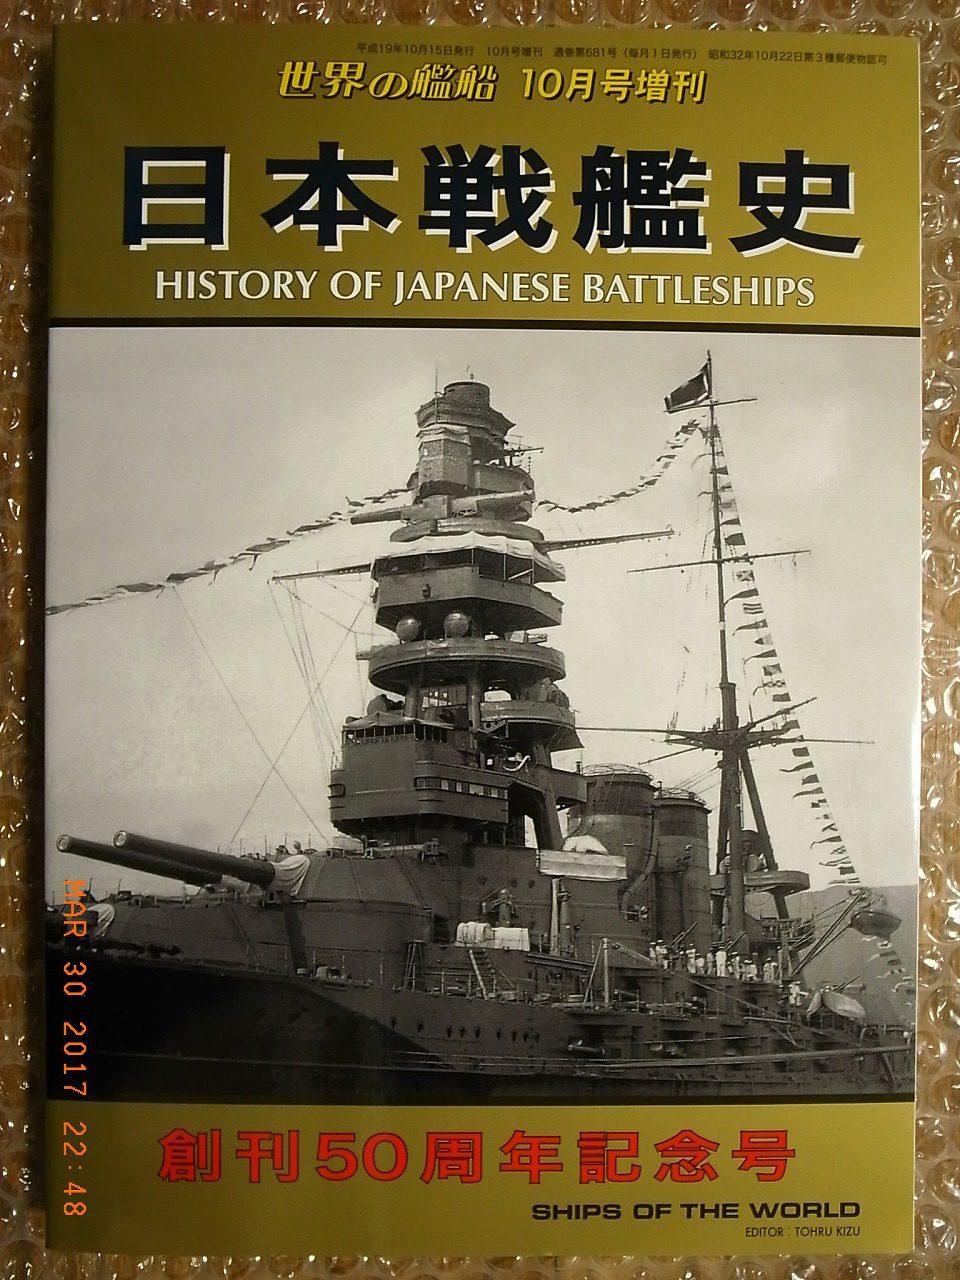 IJN BATTLESHIPS 1893-1945, PICTORIAL BOOK, SHIPS OF THE WORLD SP #681  KAIJINSHA